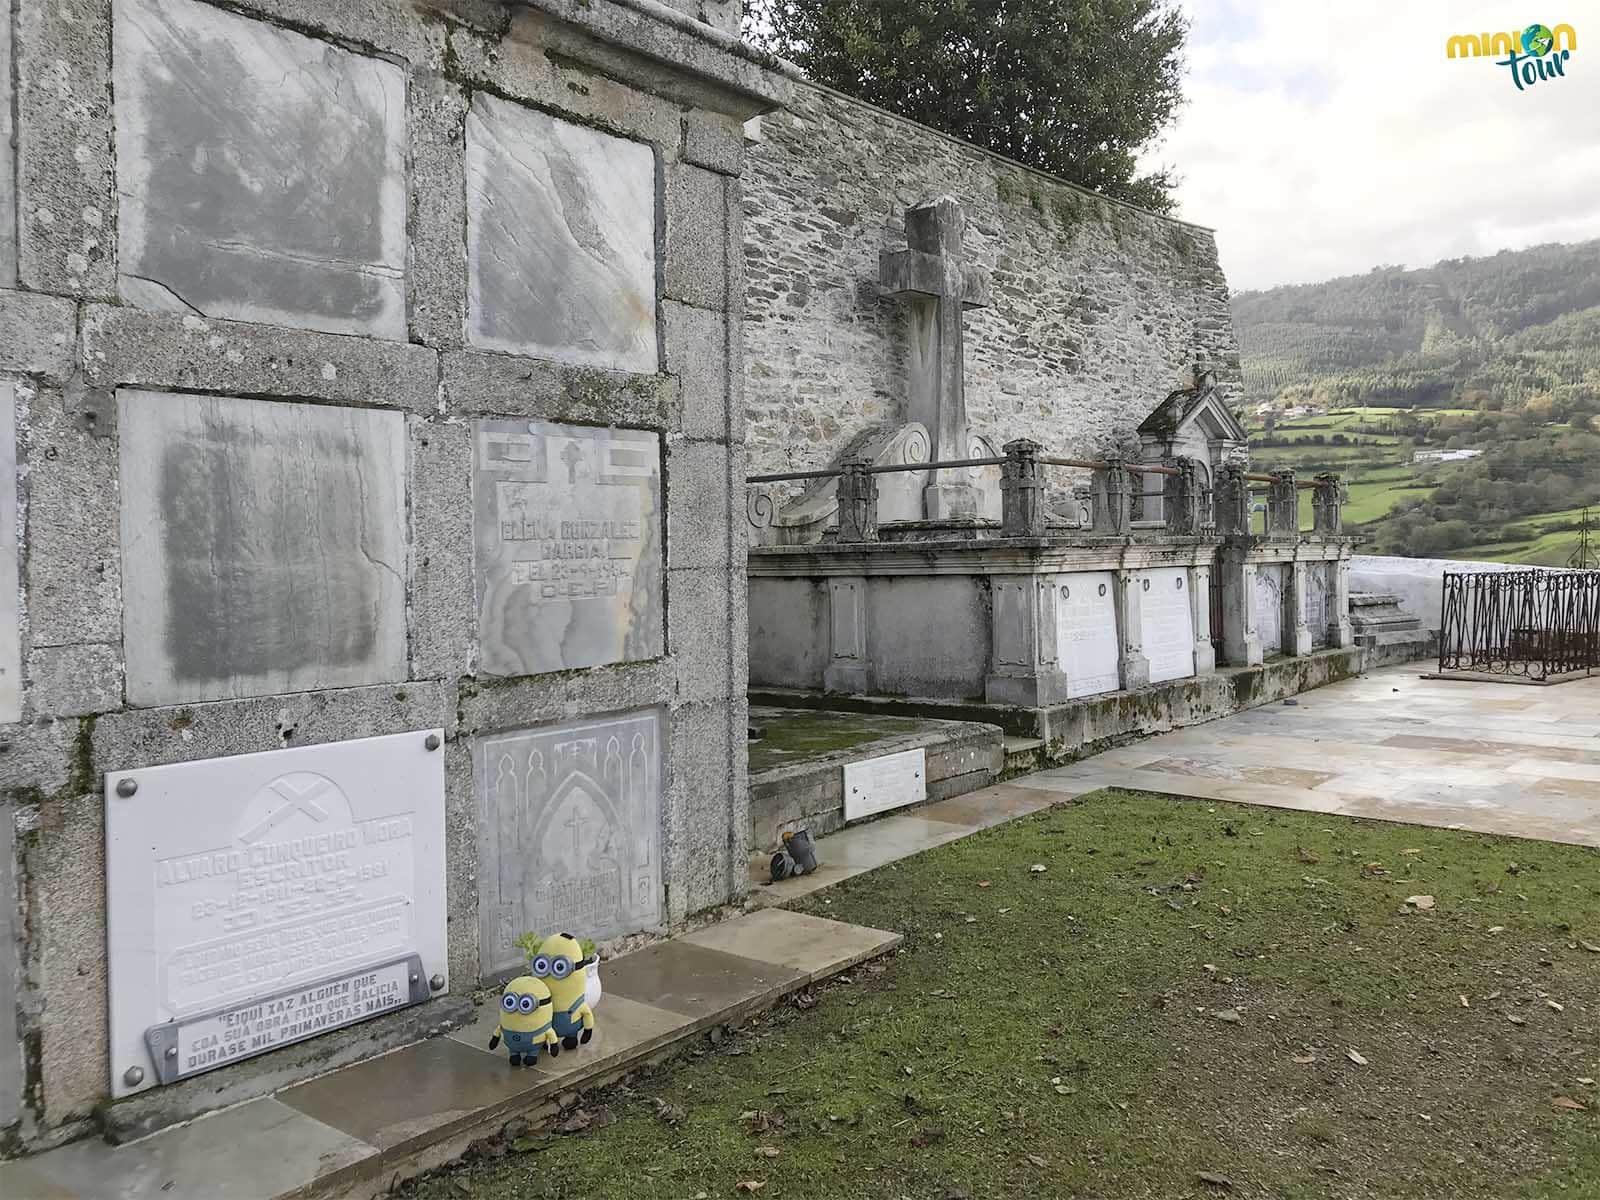 Nos ha costado pero hemos encontrado la tumba de Álvaro Cunqueiro